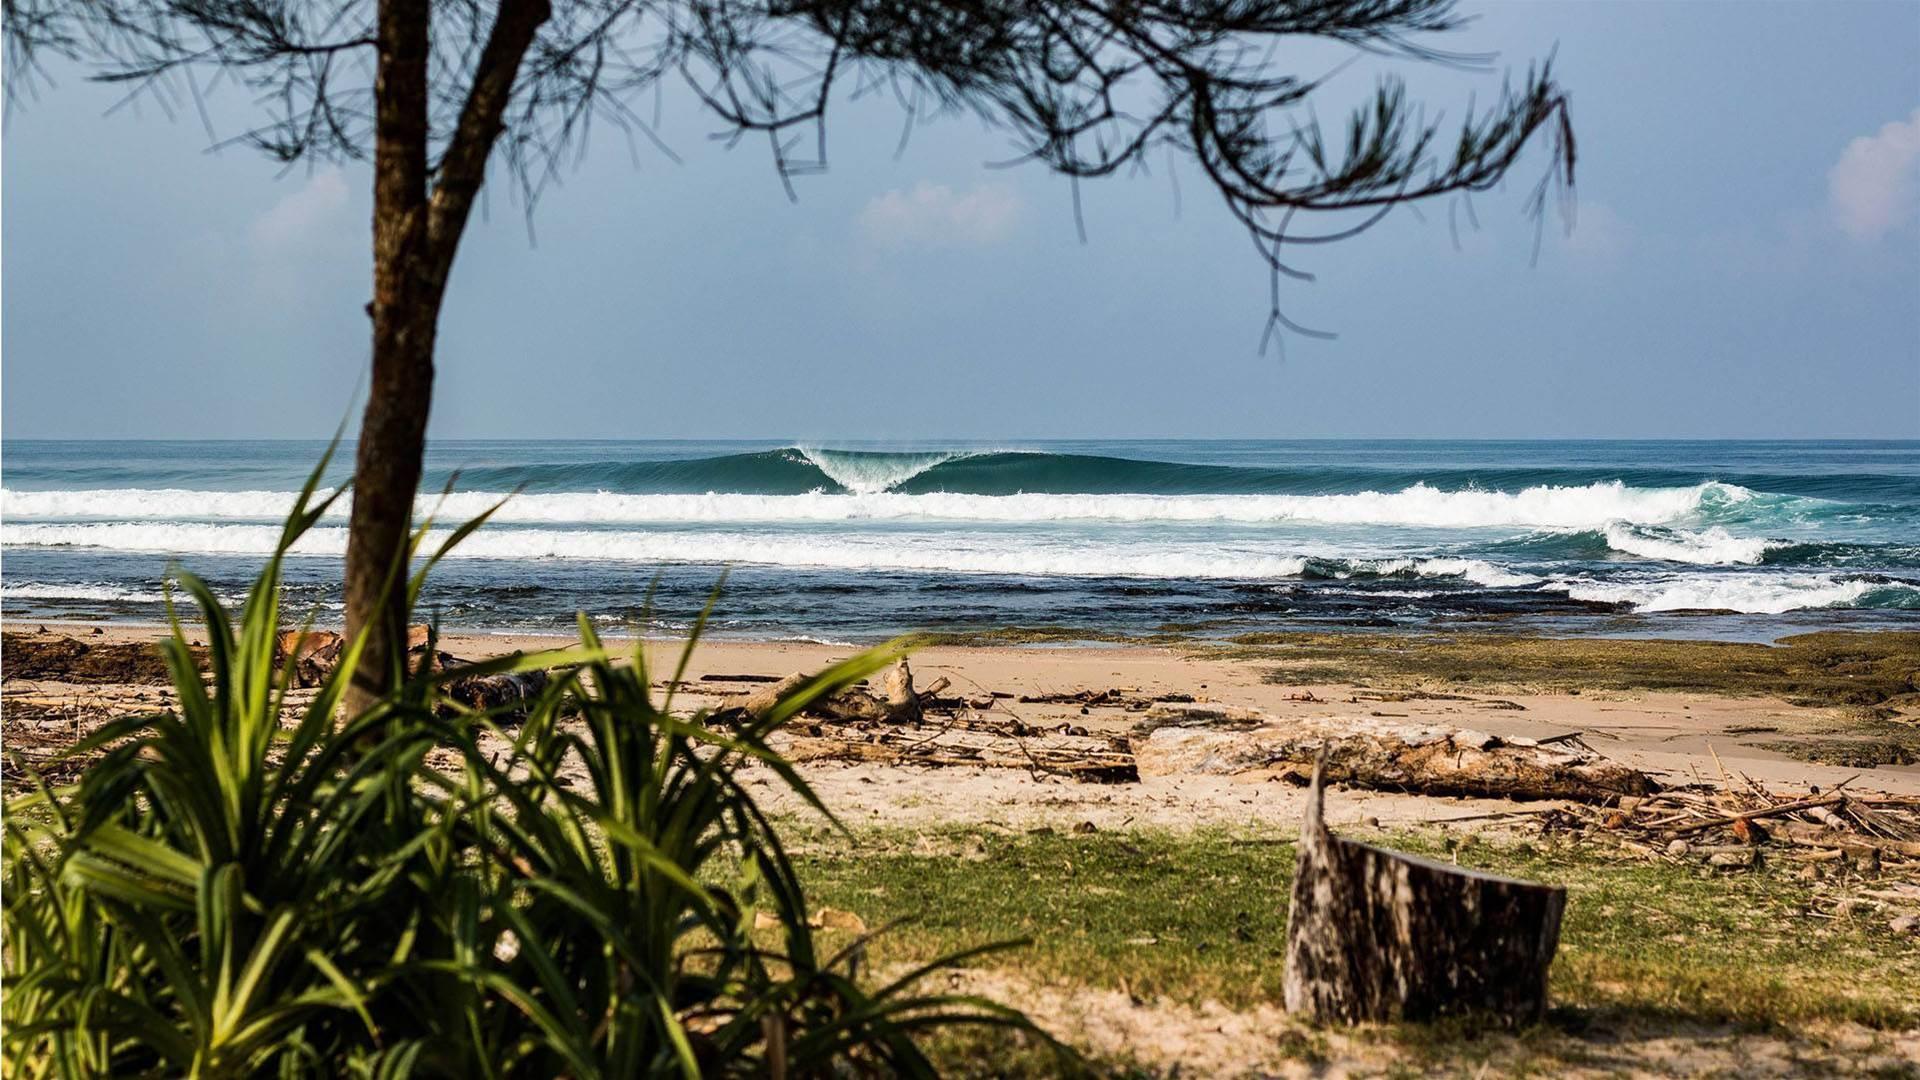 AURA SURF RESORT